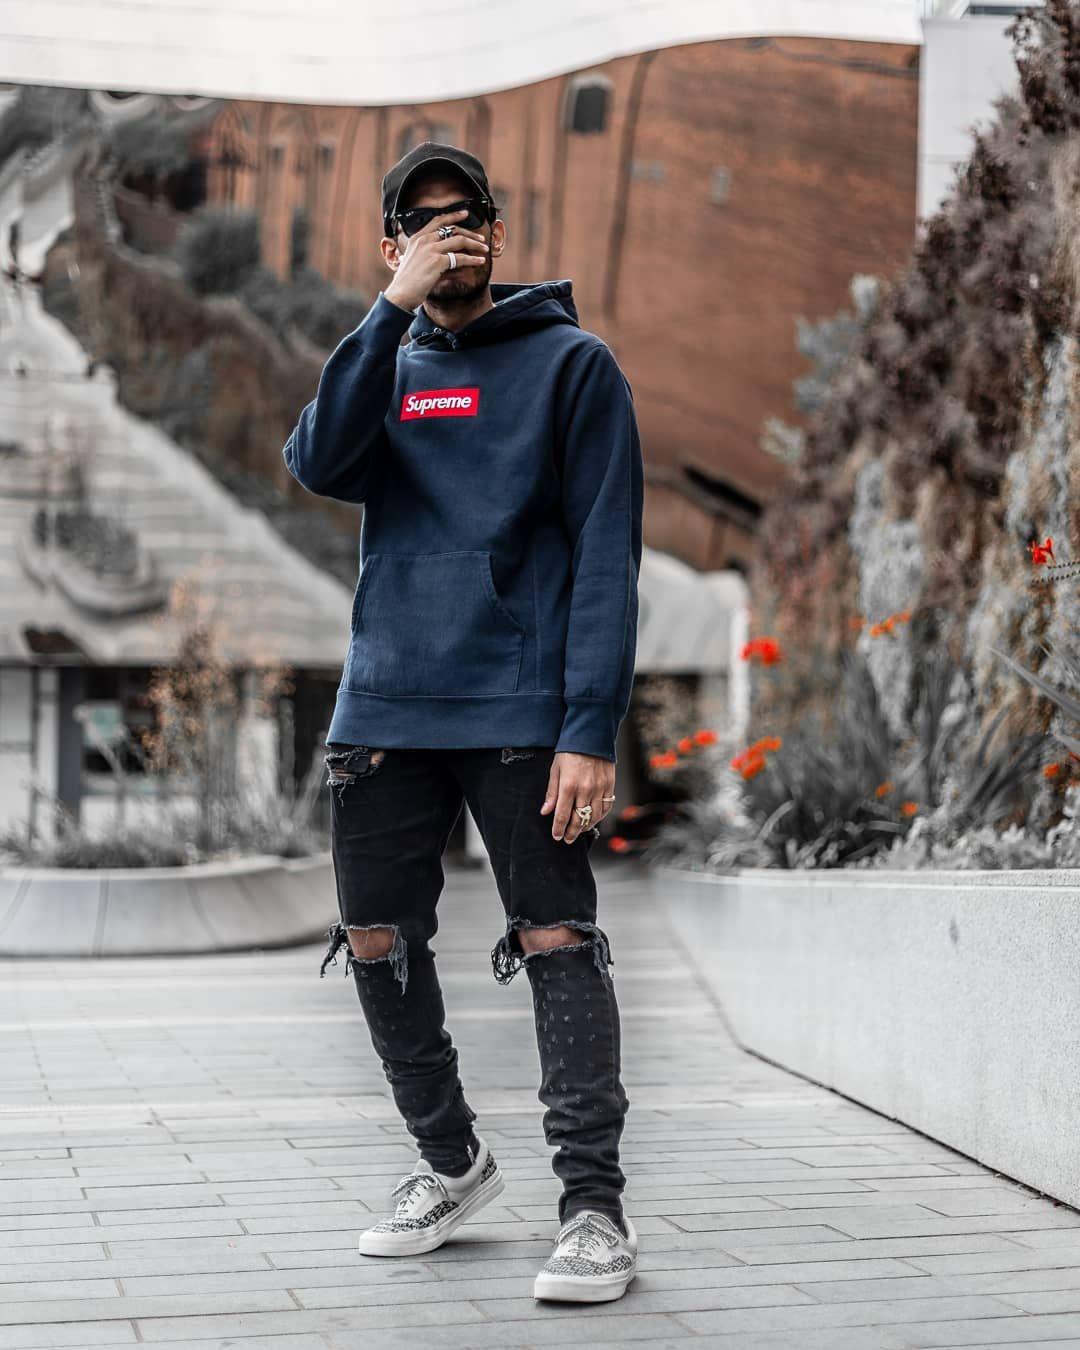 Shade Season Streetbeast Zakdaya Street Wear Bomber Jacket Seasons